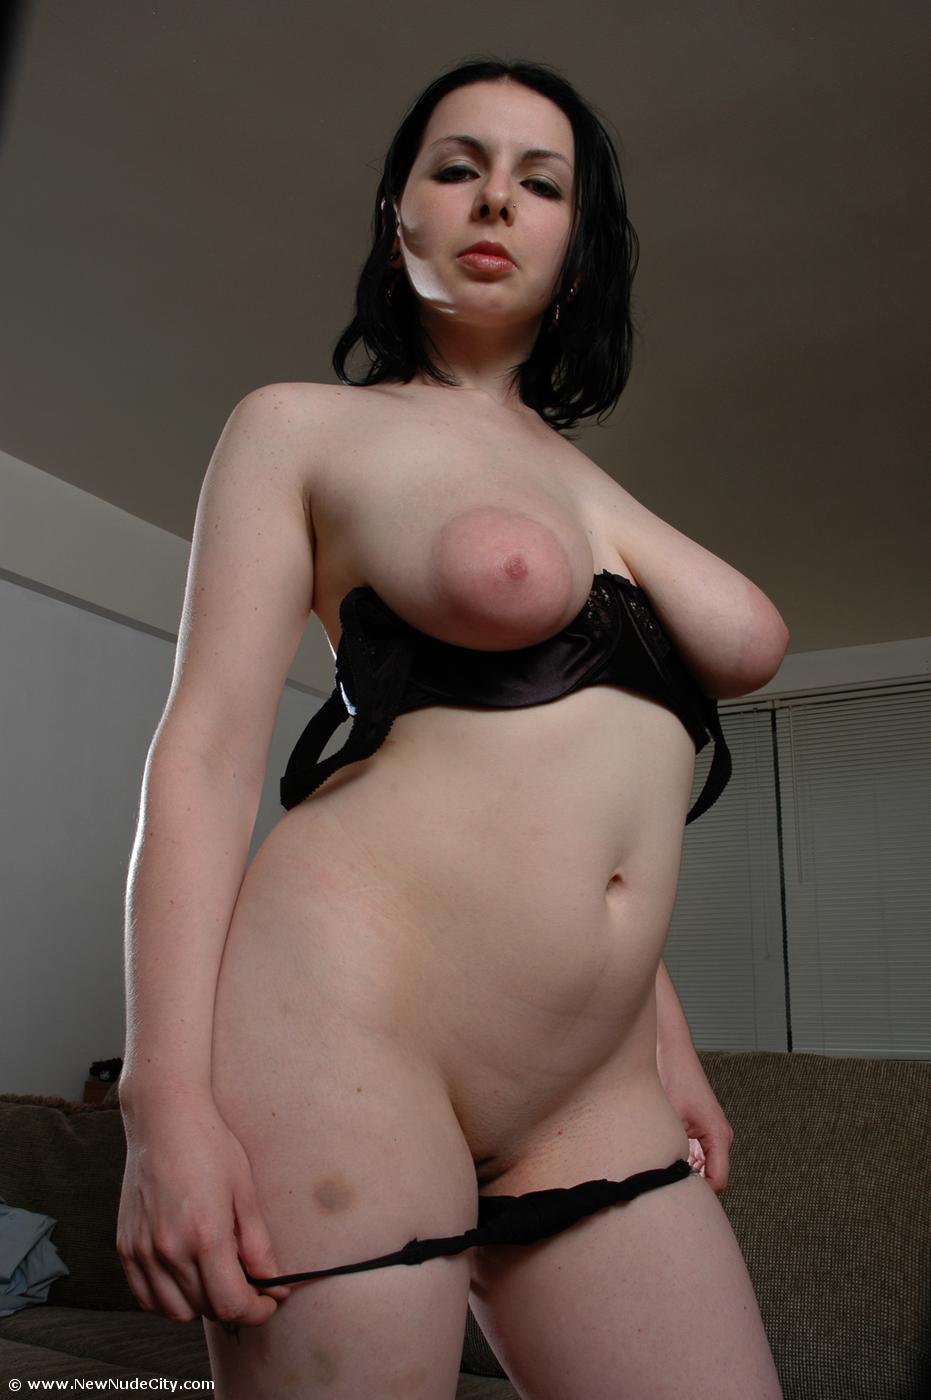 Women of walmart nude